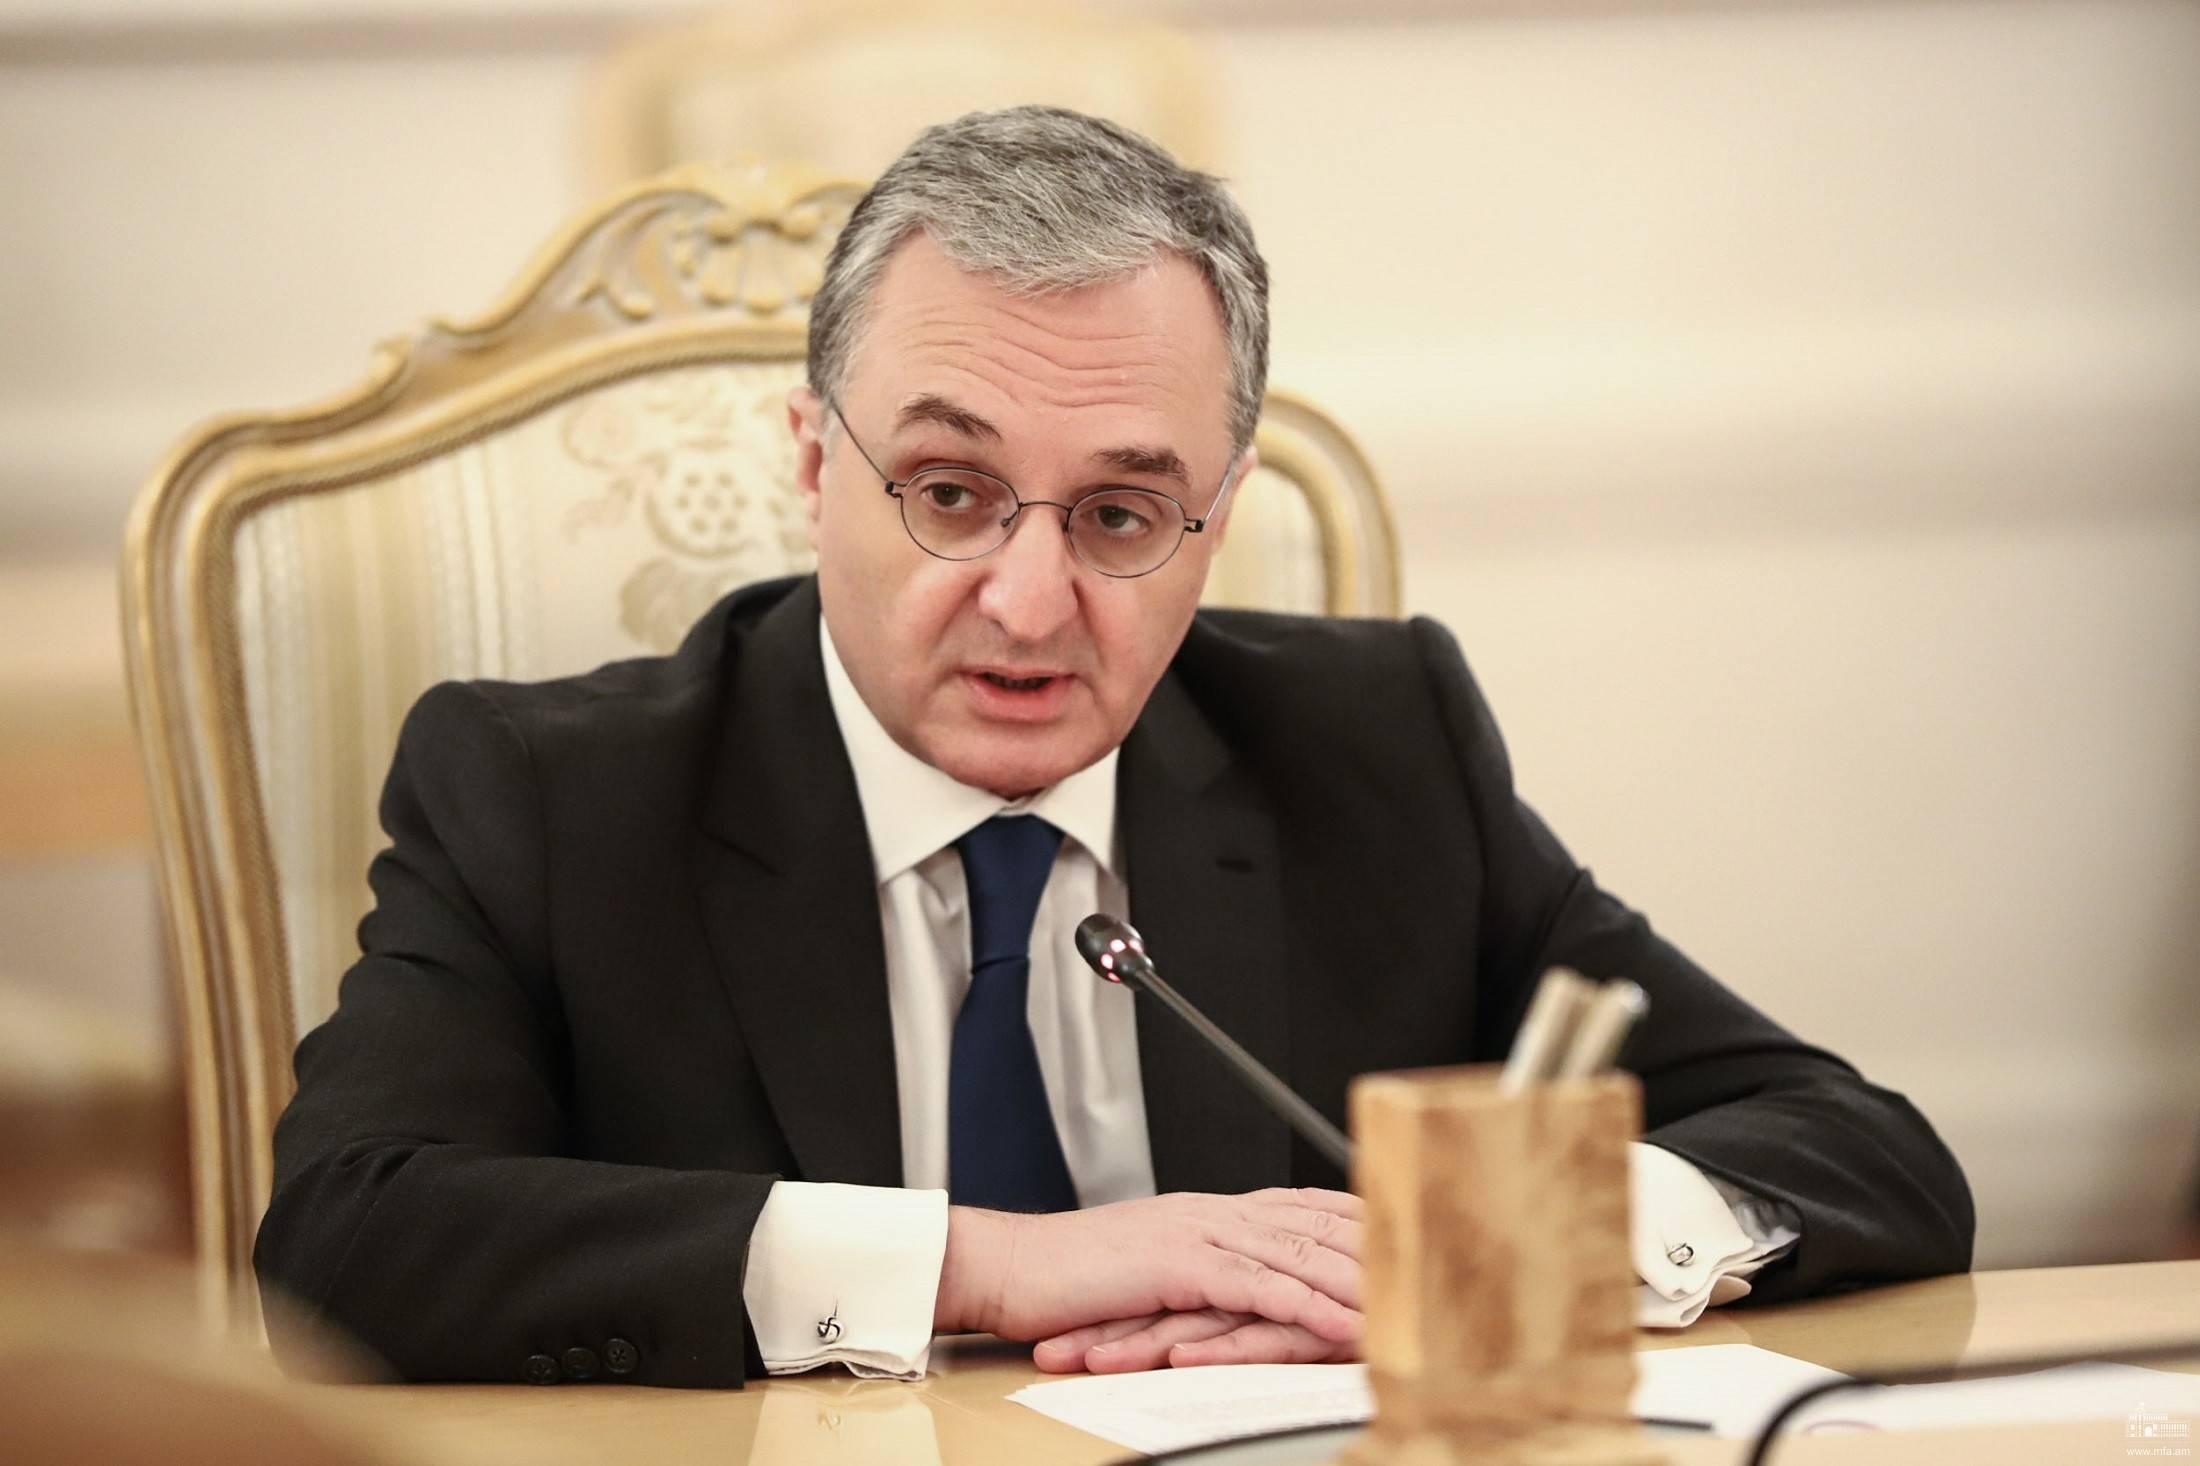 Foreign Minister Zohrab Mnatsakanyan's interview to BBC Newshour